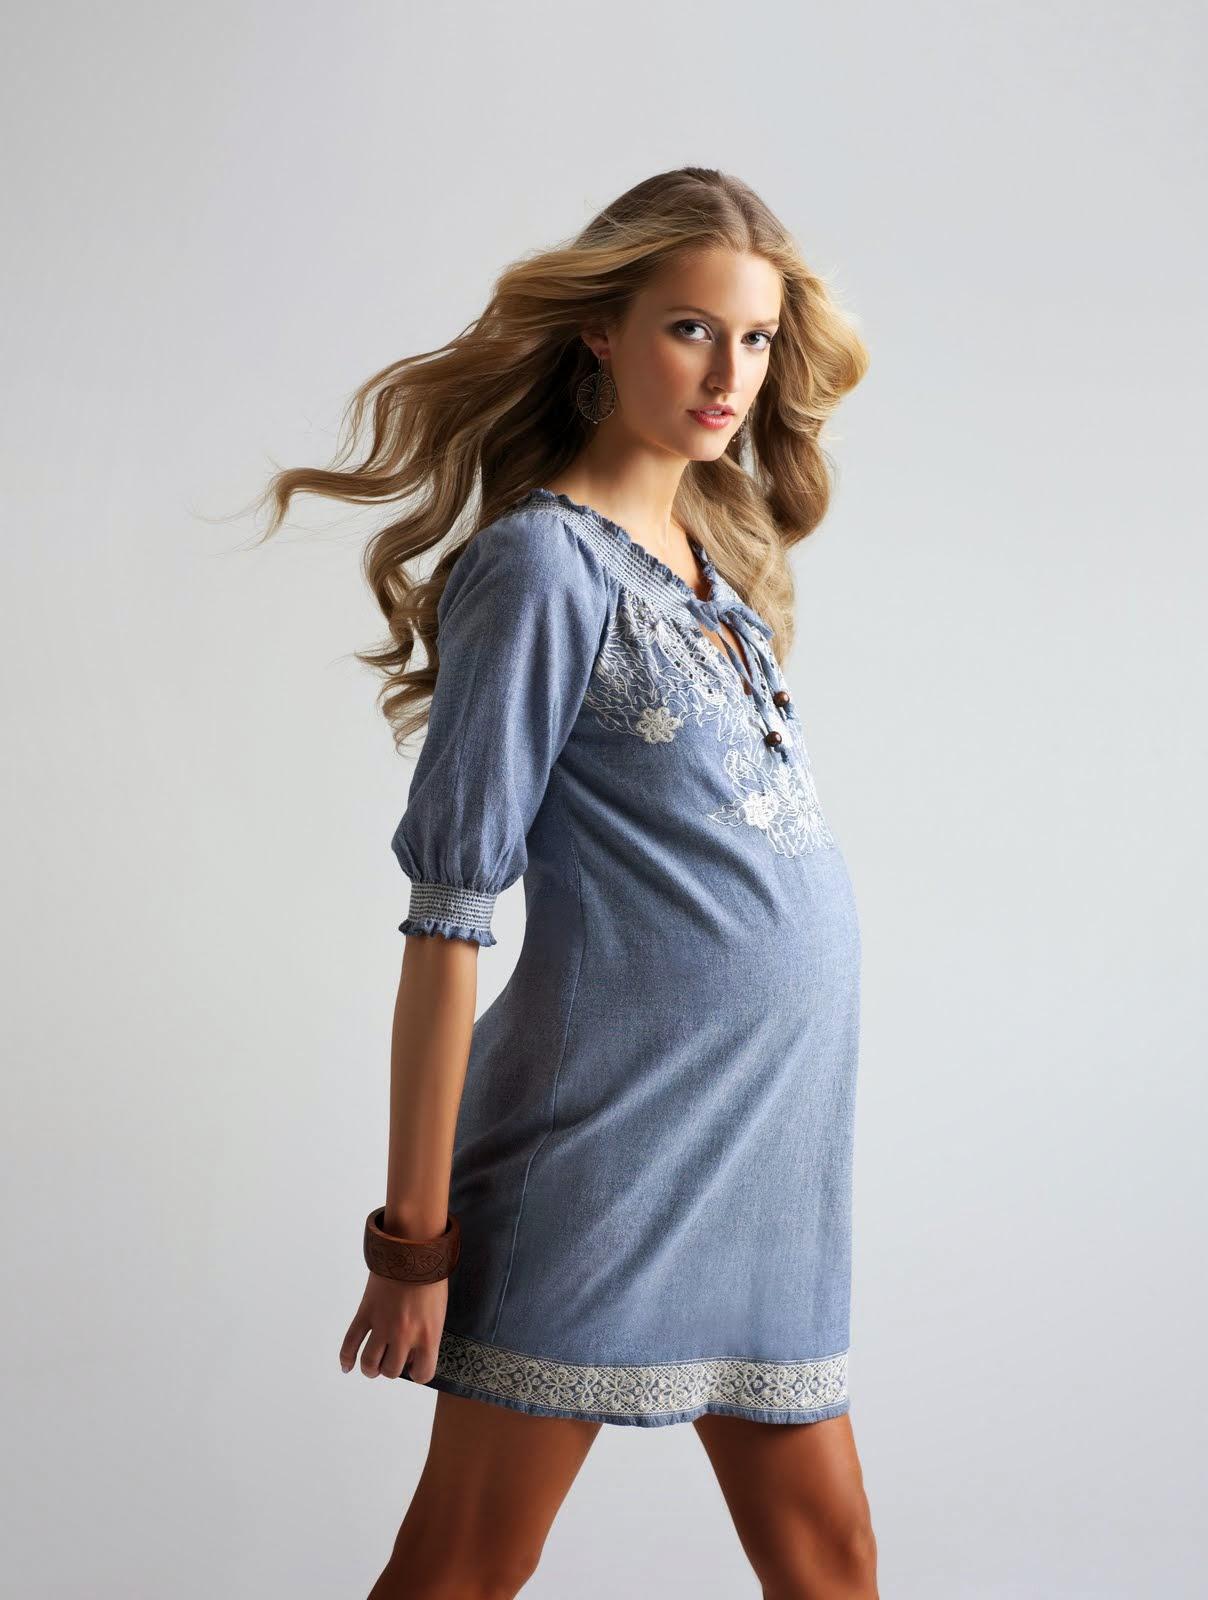 516e3a5d064 fashions show  Find Cute Summer Maternity Wear Designs Silly Fashion